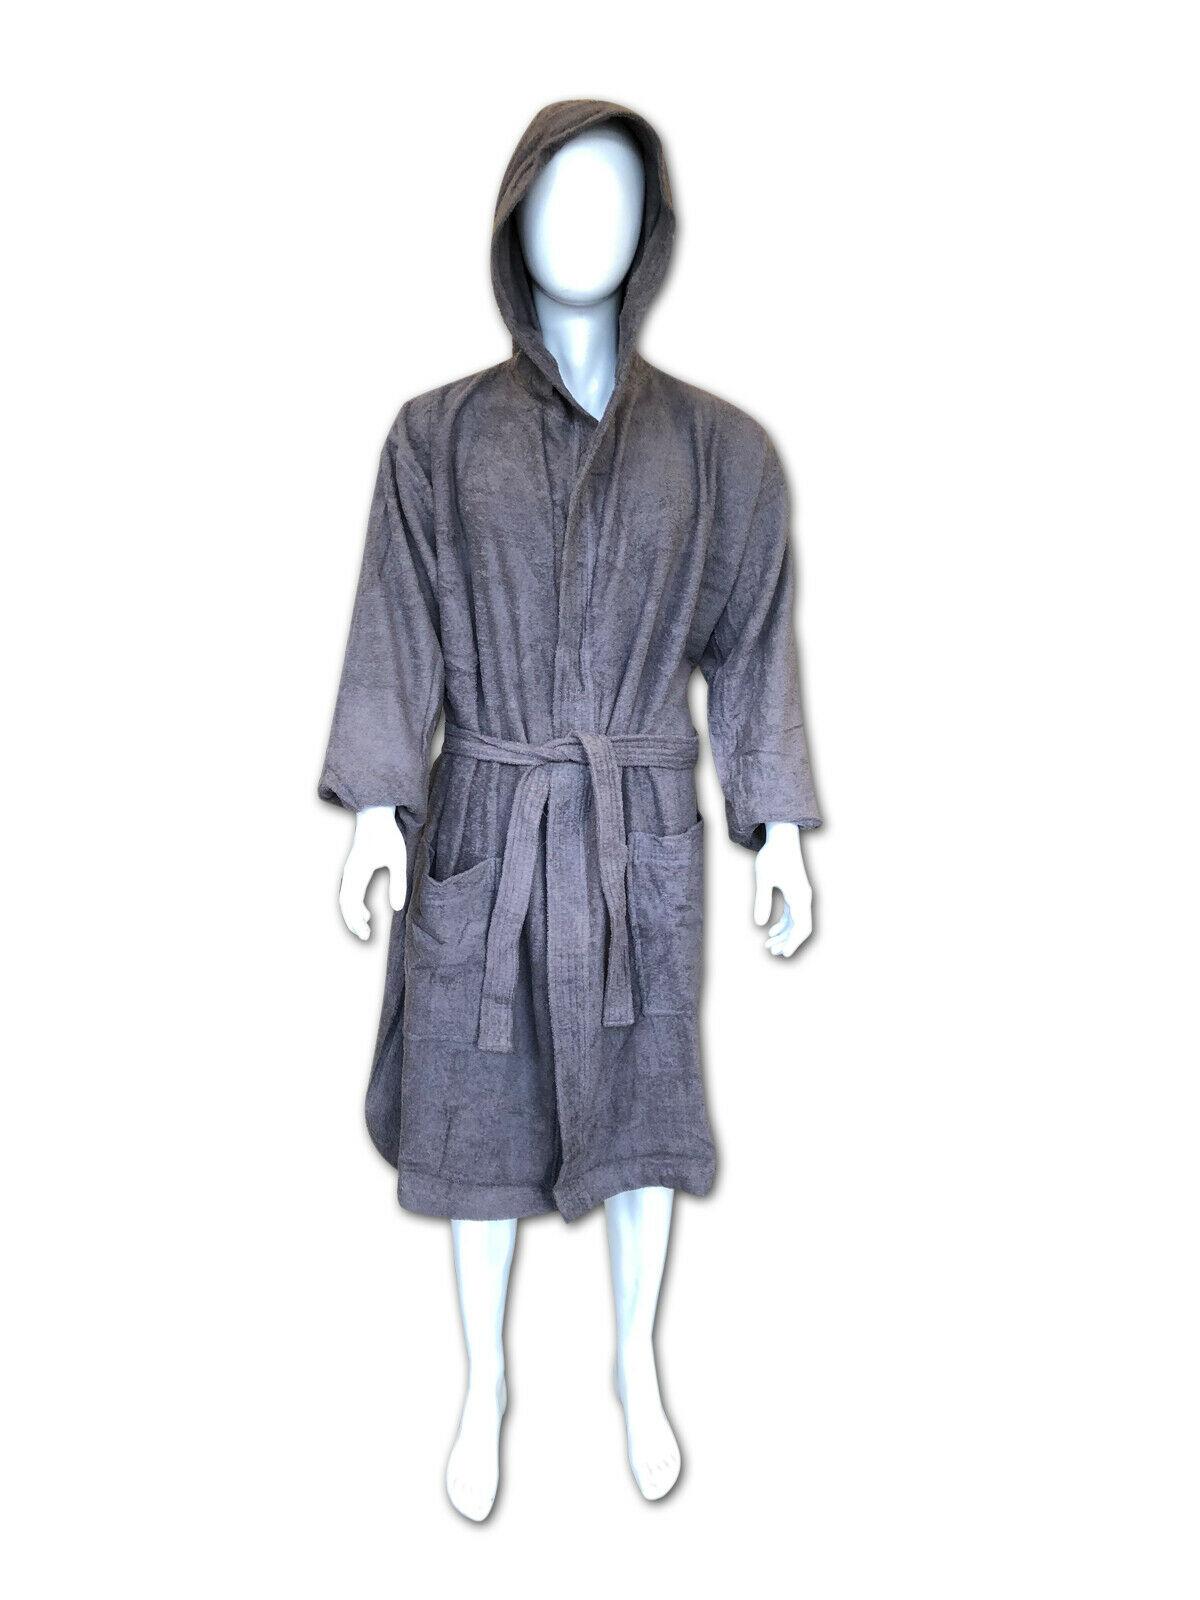 100/% LUXURY EGYPTIAN COTTON HOODED BATH ROBE DRESSING TERRY TOWELING MEN /& WOMEN